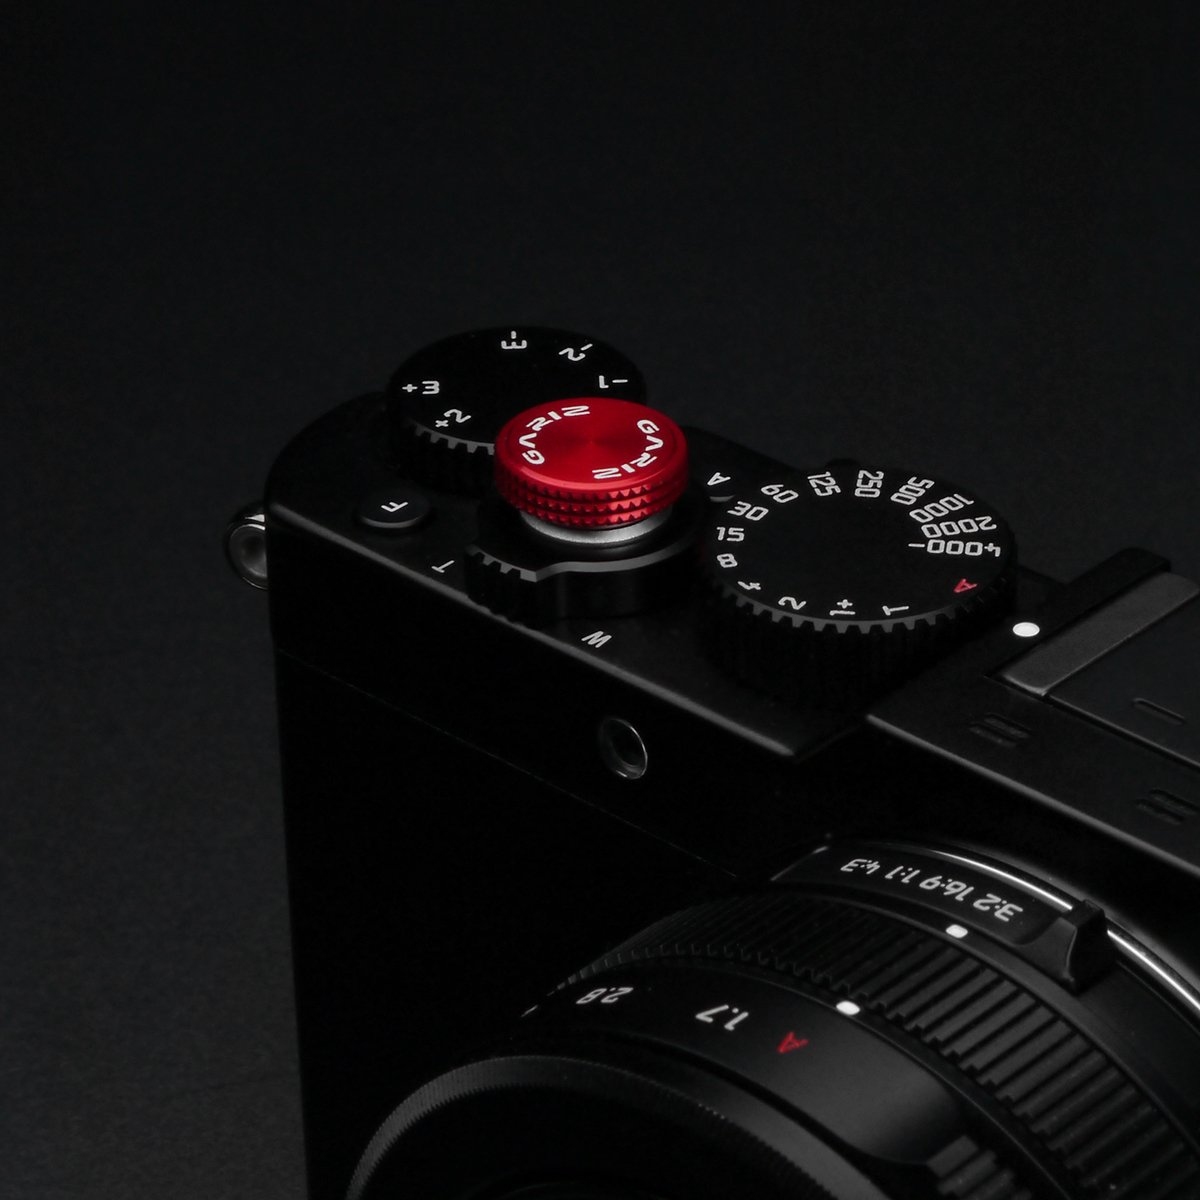 Gariz Metal XA-SBA6 Camera Sticker Type Soft Button for Sony, Fuji, Canon, Nikon, Lumix, Leica, Red